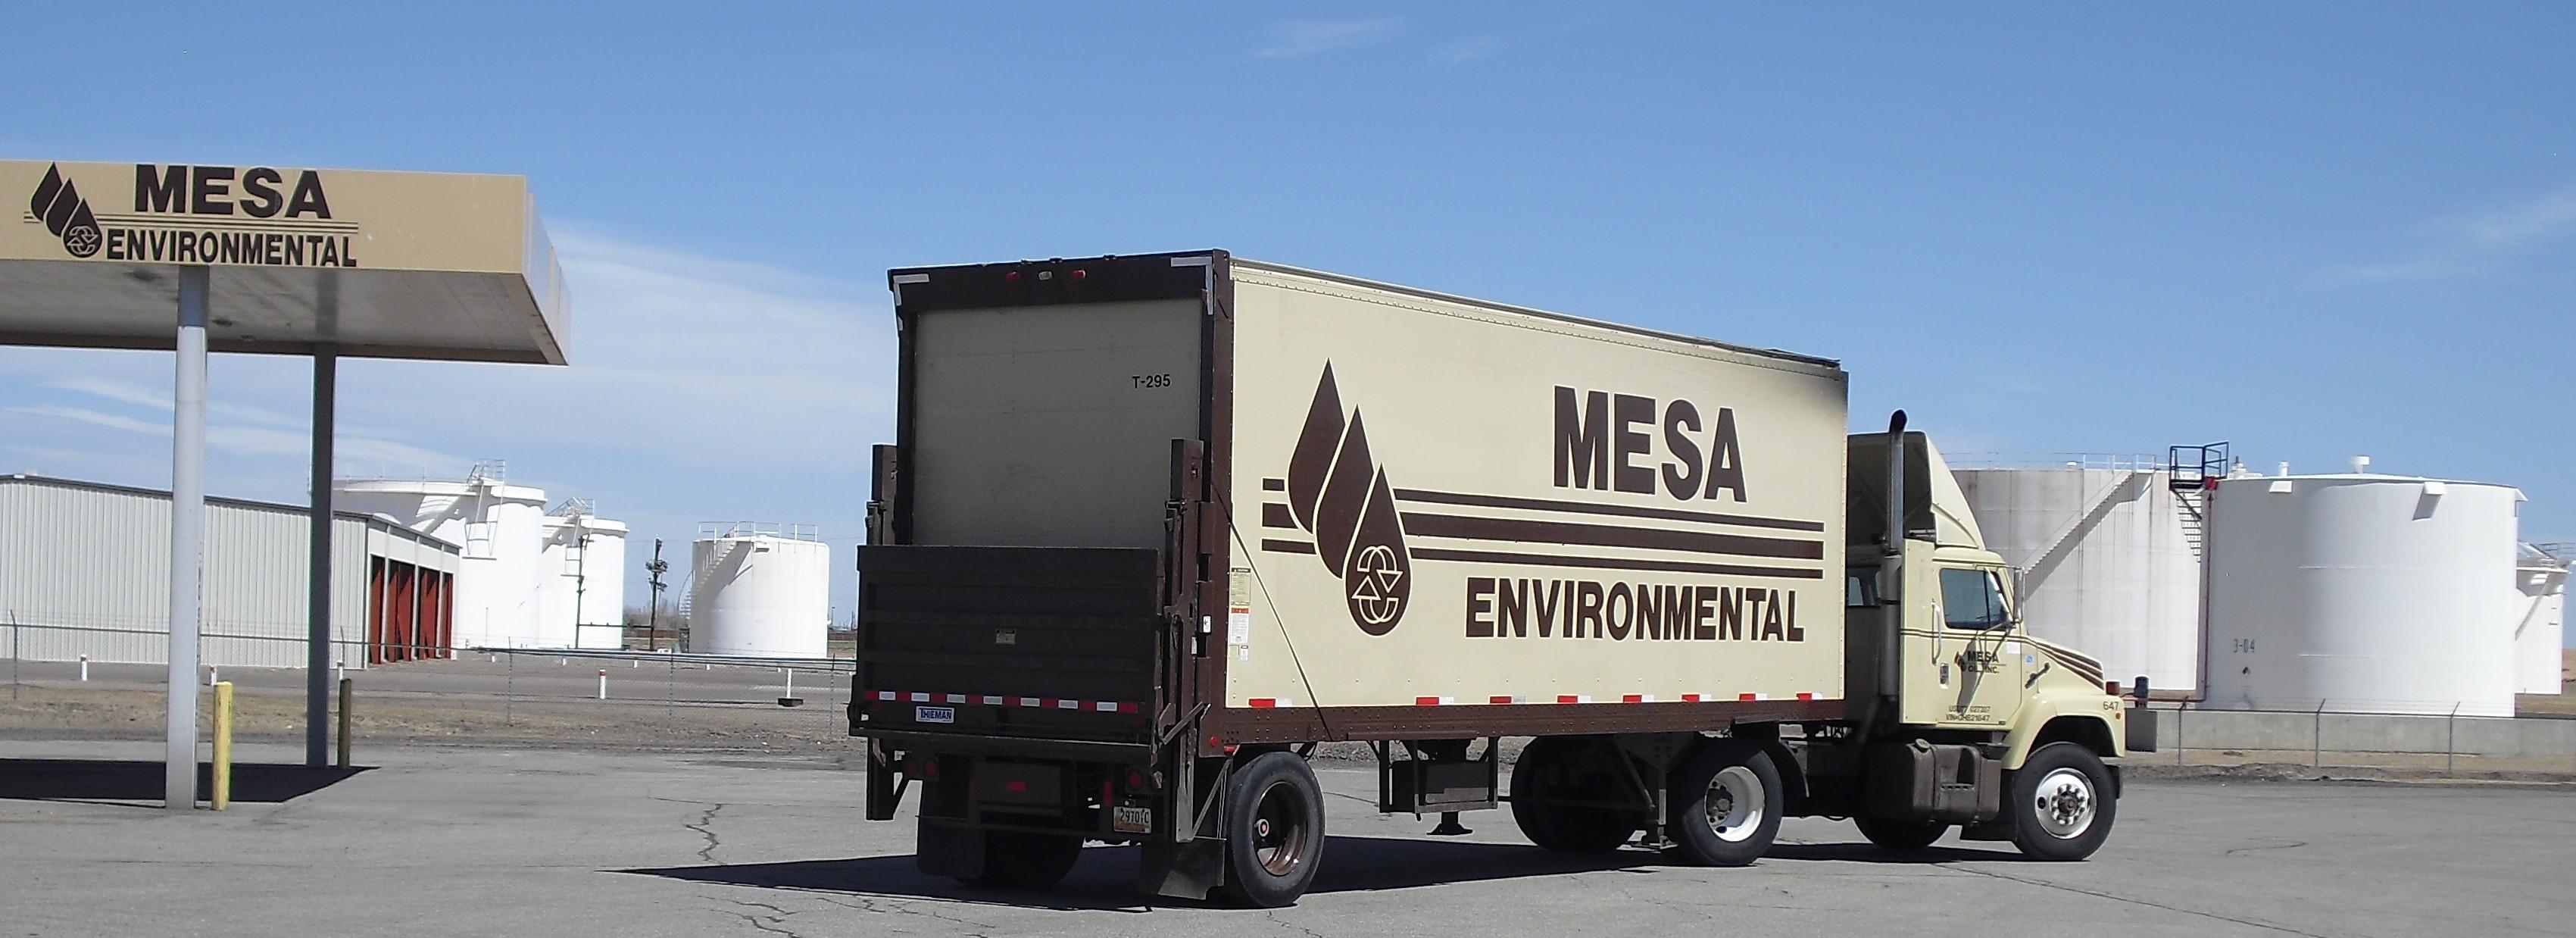 Mesa-Oil-Trucks (20)